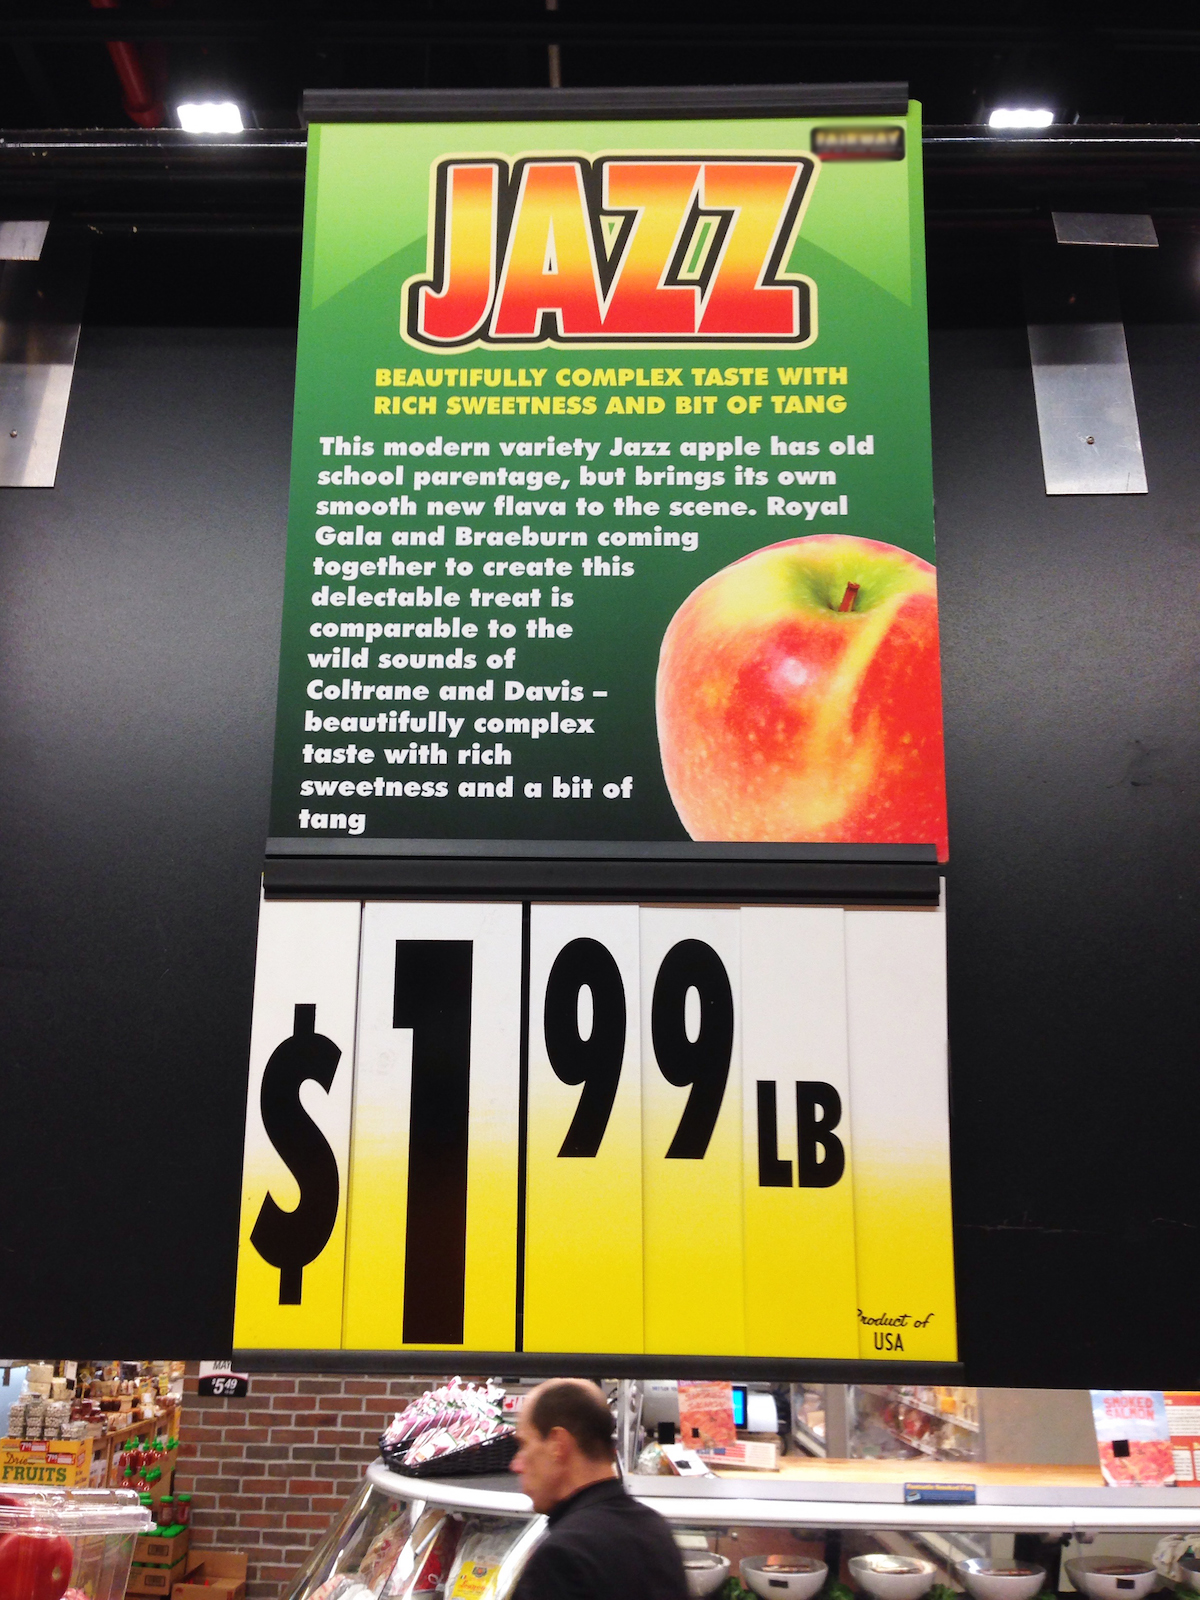 jazz in marketing, jazz apples